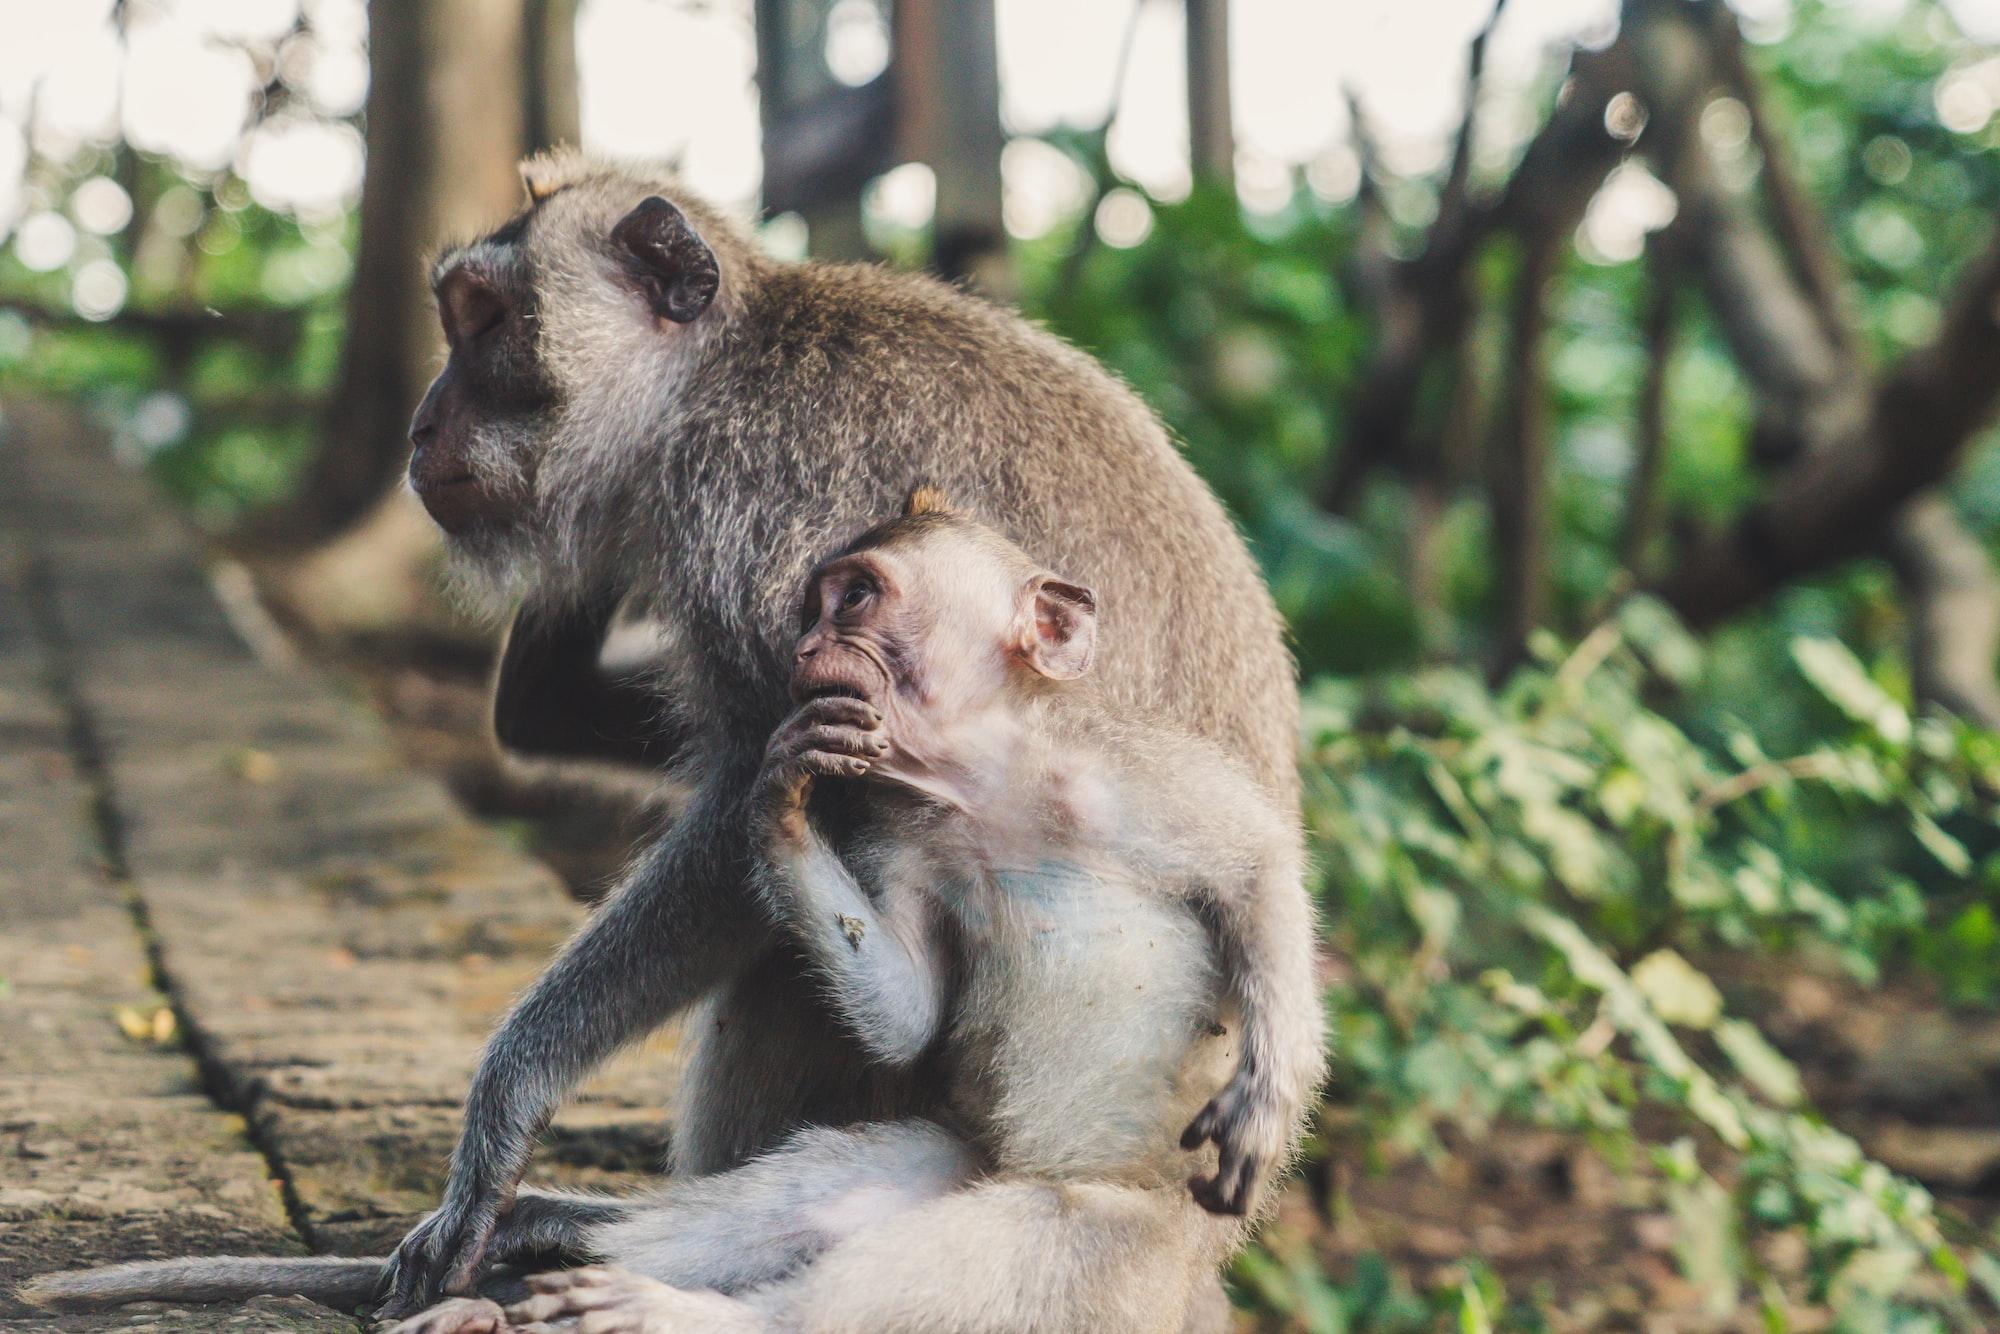 Monkey mum and son in the monkey forest, Ubud